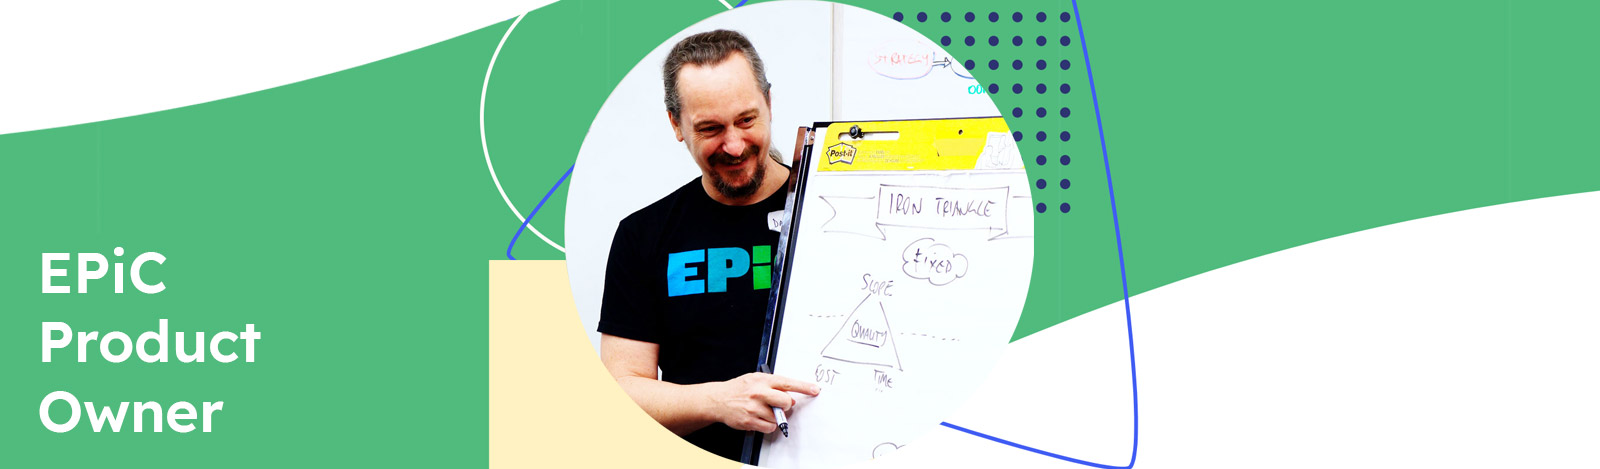 Courses-Epic-Agile---ProductOwner-Training_ARLO_1600x469.jpg